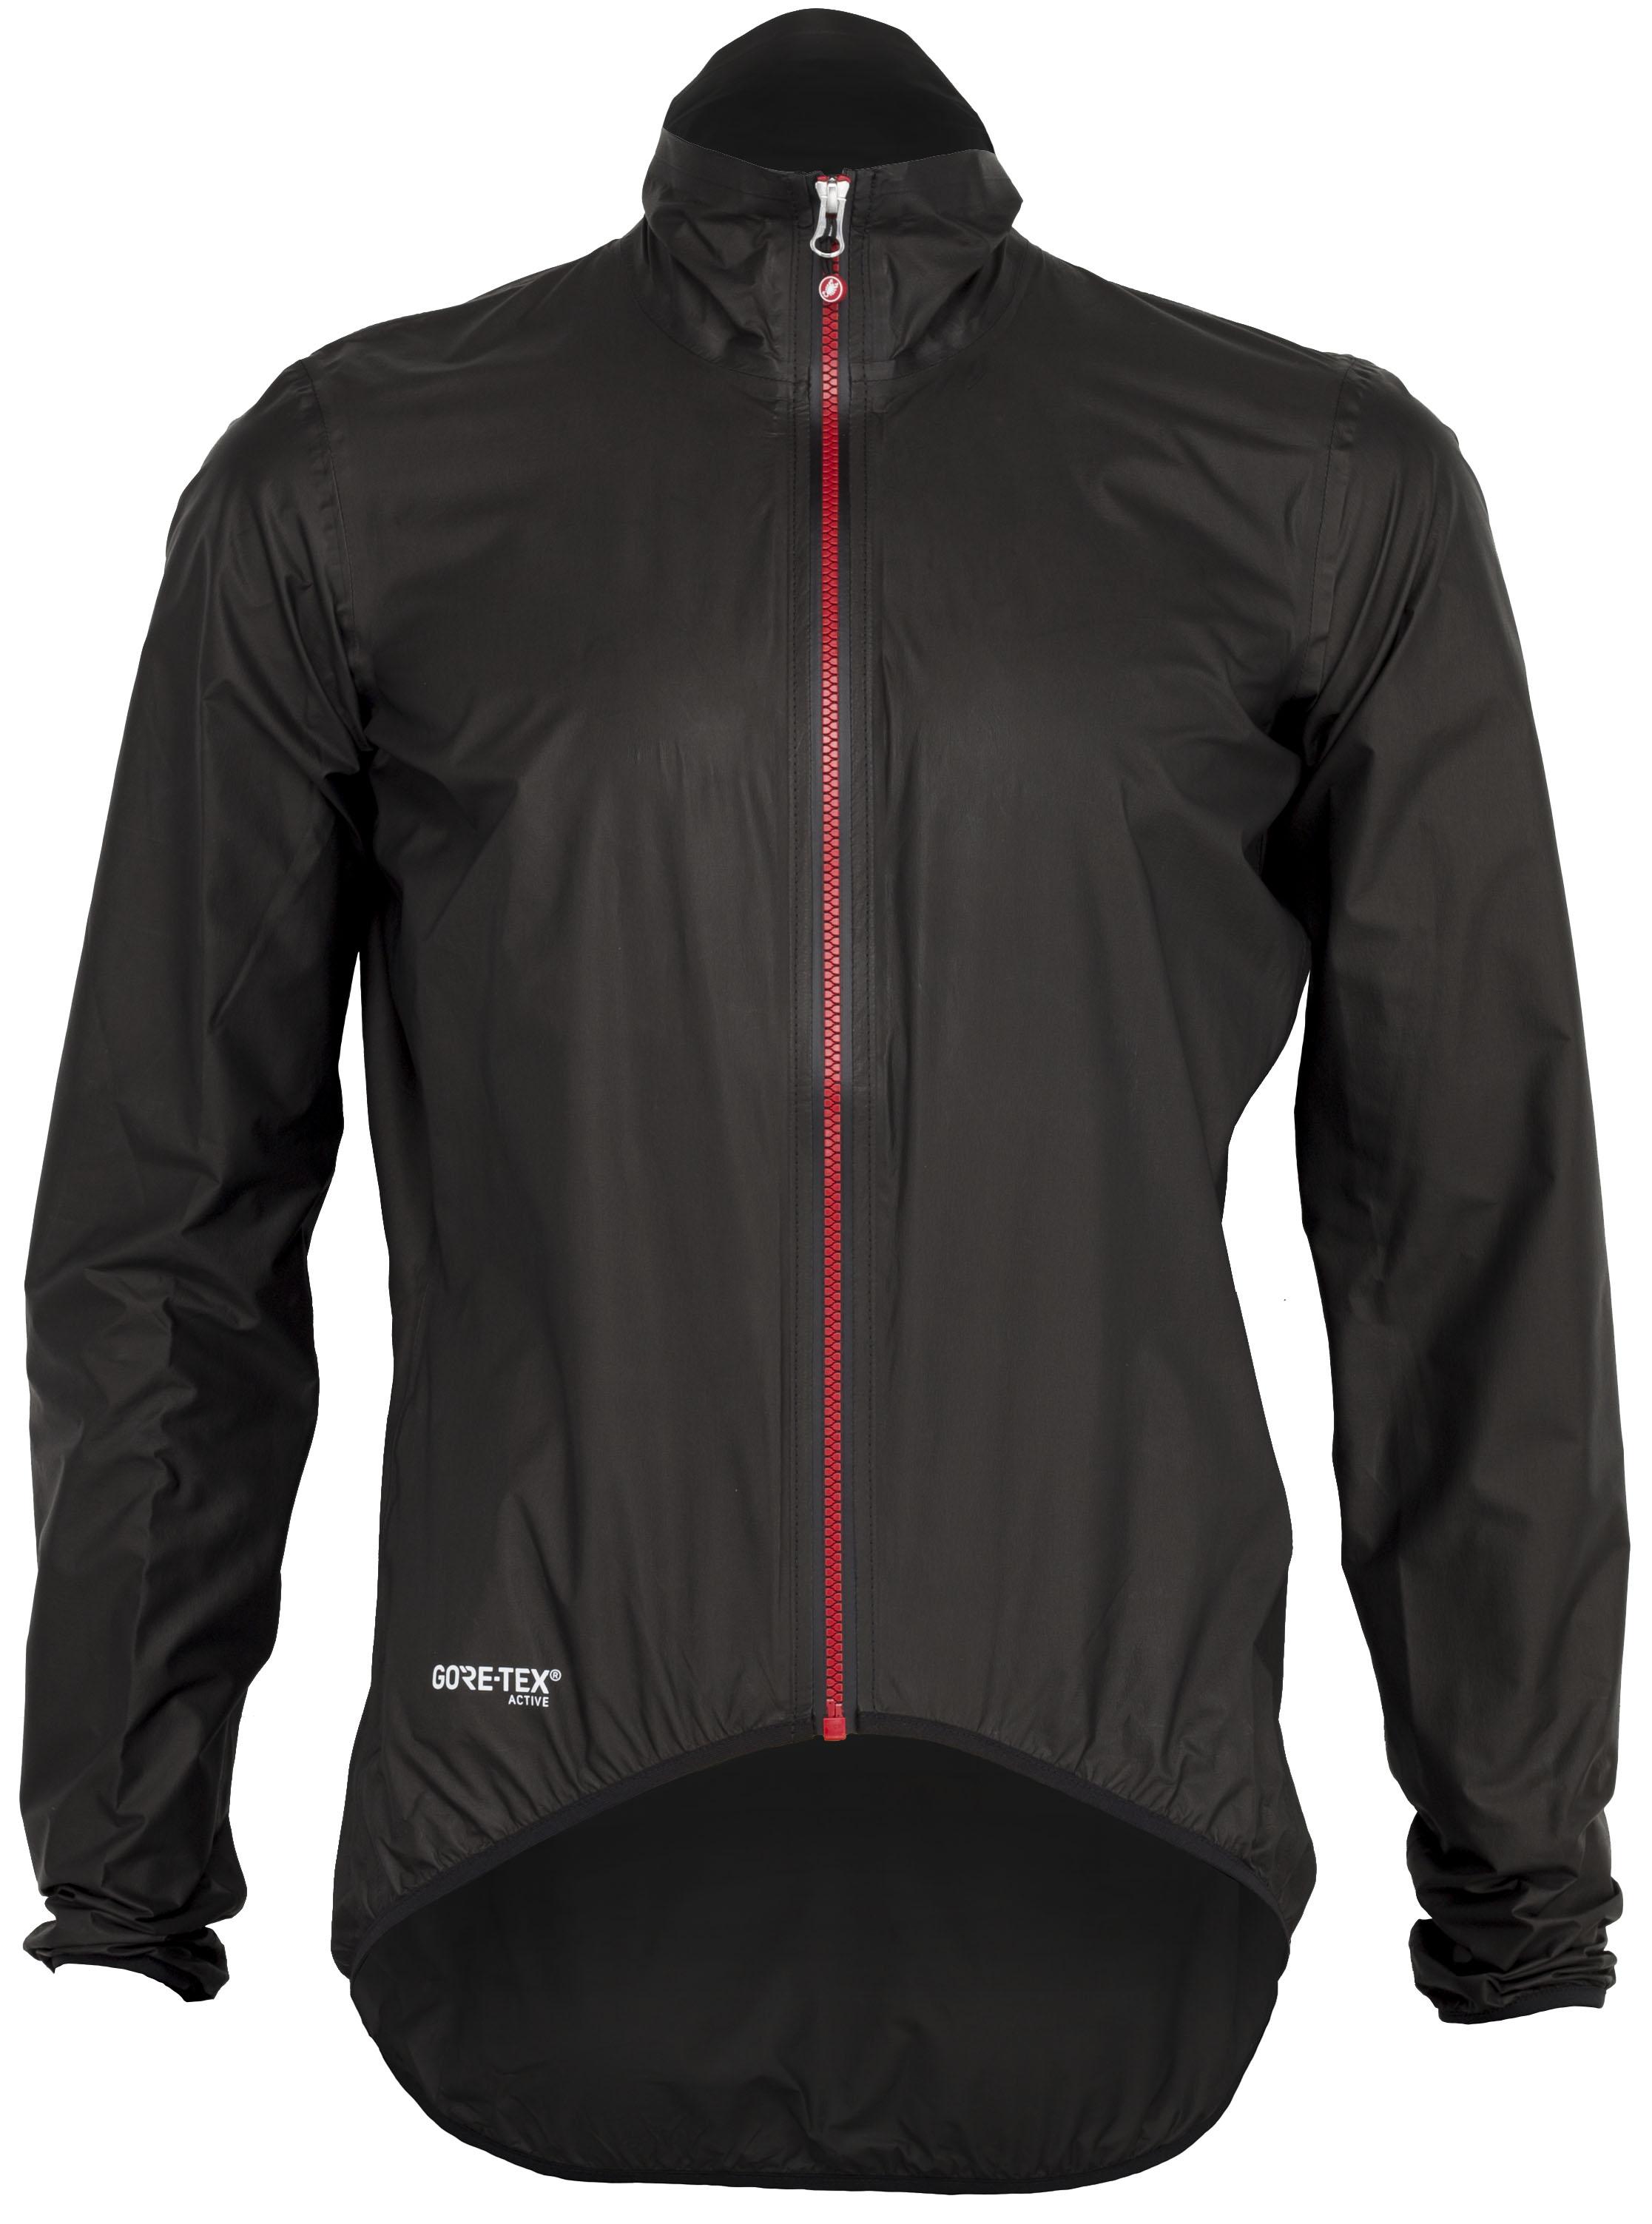 6939f7ff4 Castelli Idro 2 Cycling Rain Jacket